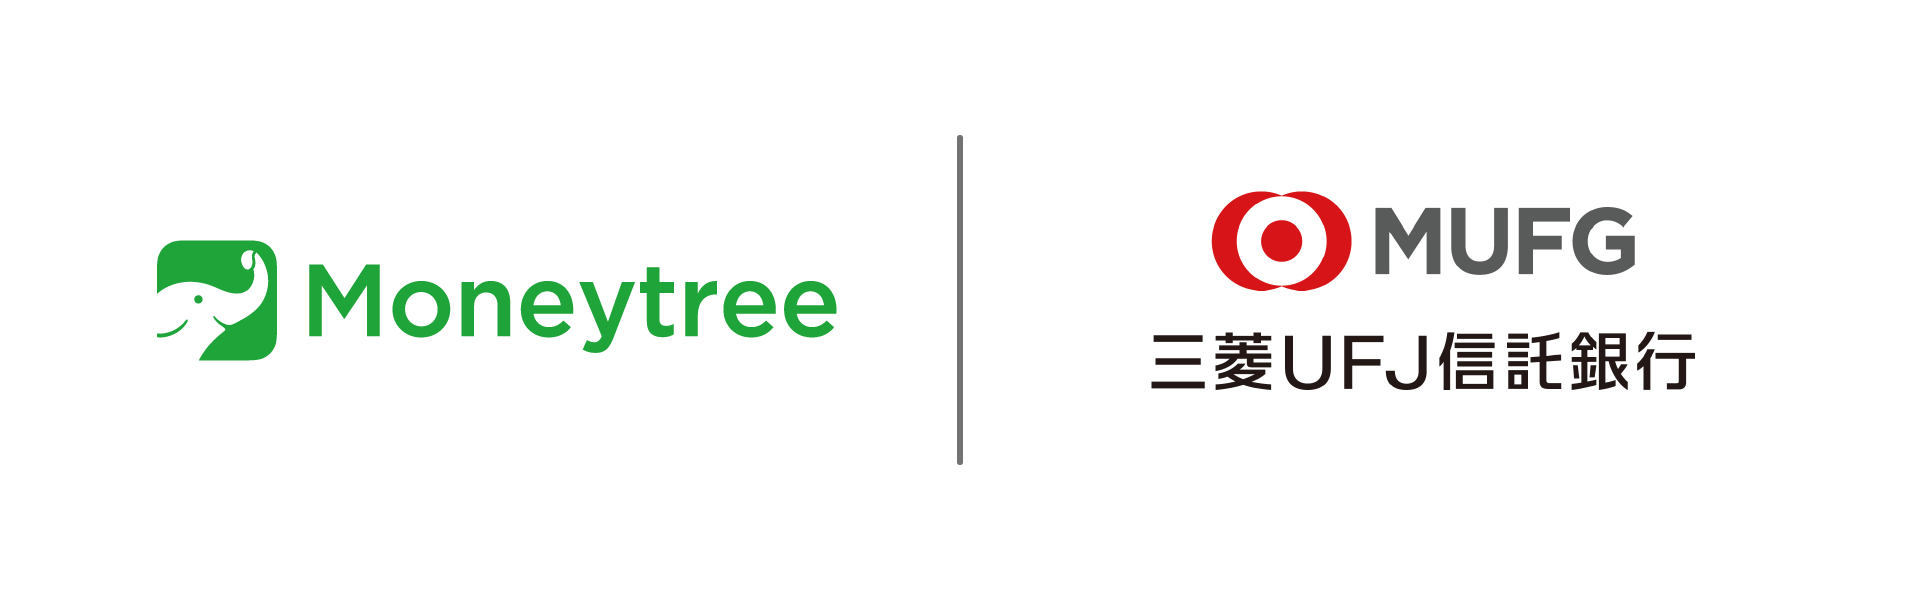 PressRelease MUFG Logo